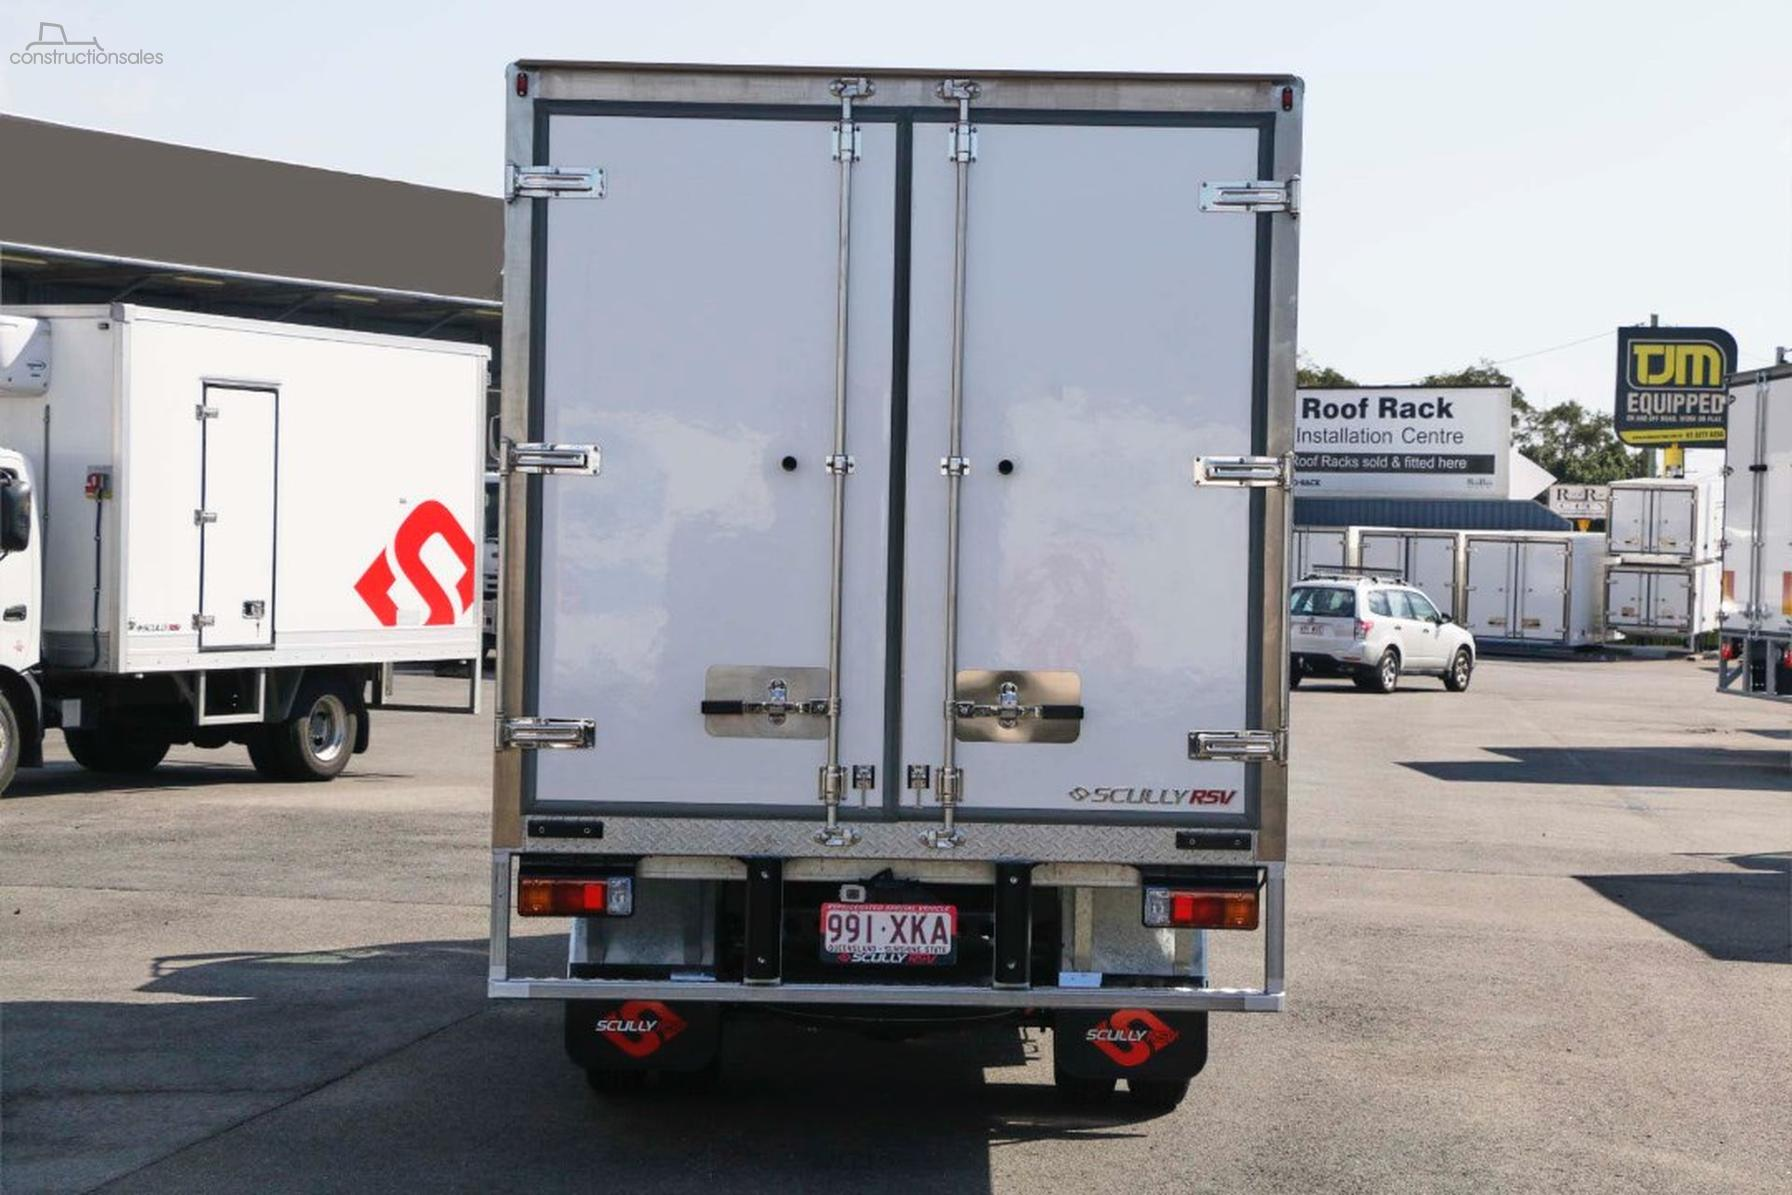 a1e3bba6b6 2018 Hino 616 Scully RSV 2 Ton 3 Pallet Thermo Transit Auto Freezer-OAG-AD-15071596  - constructionsales.com.au